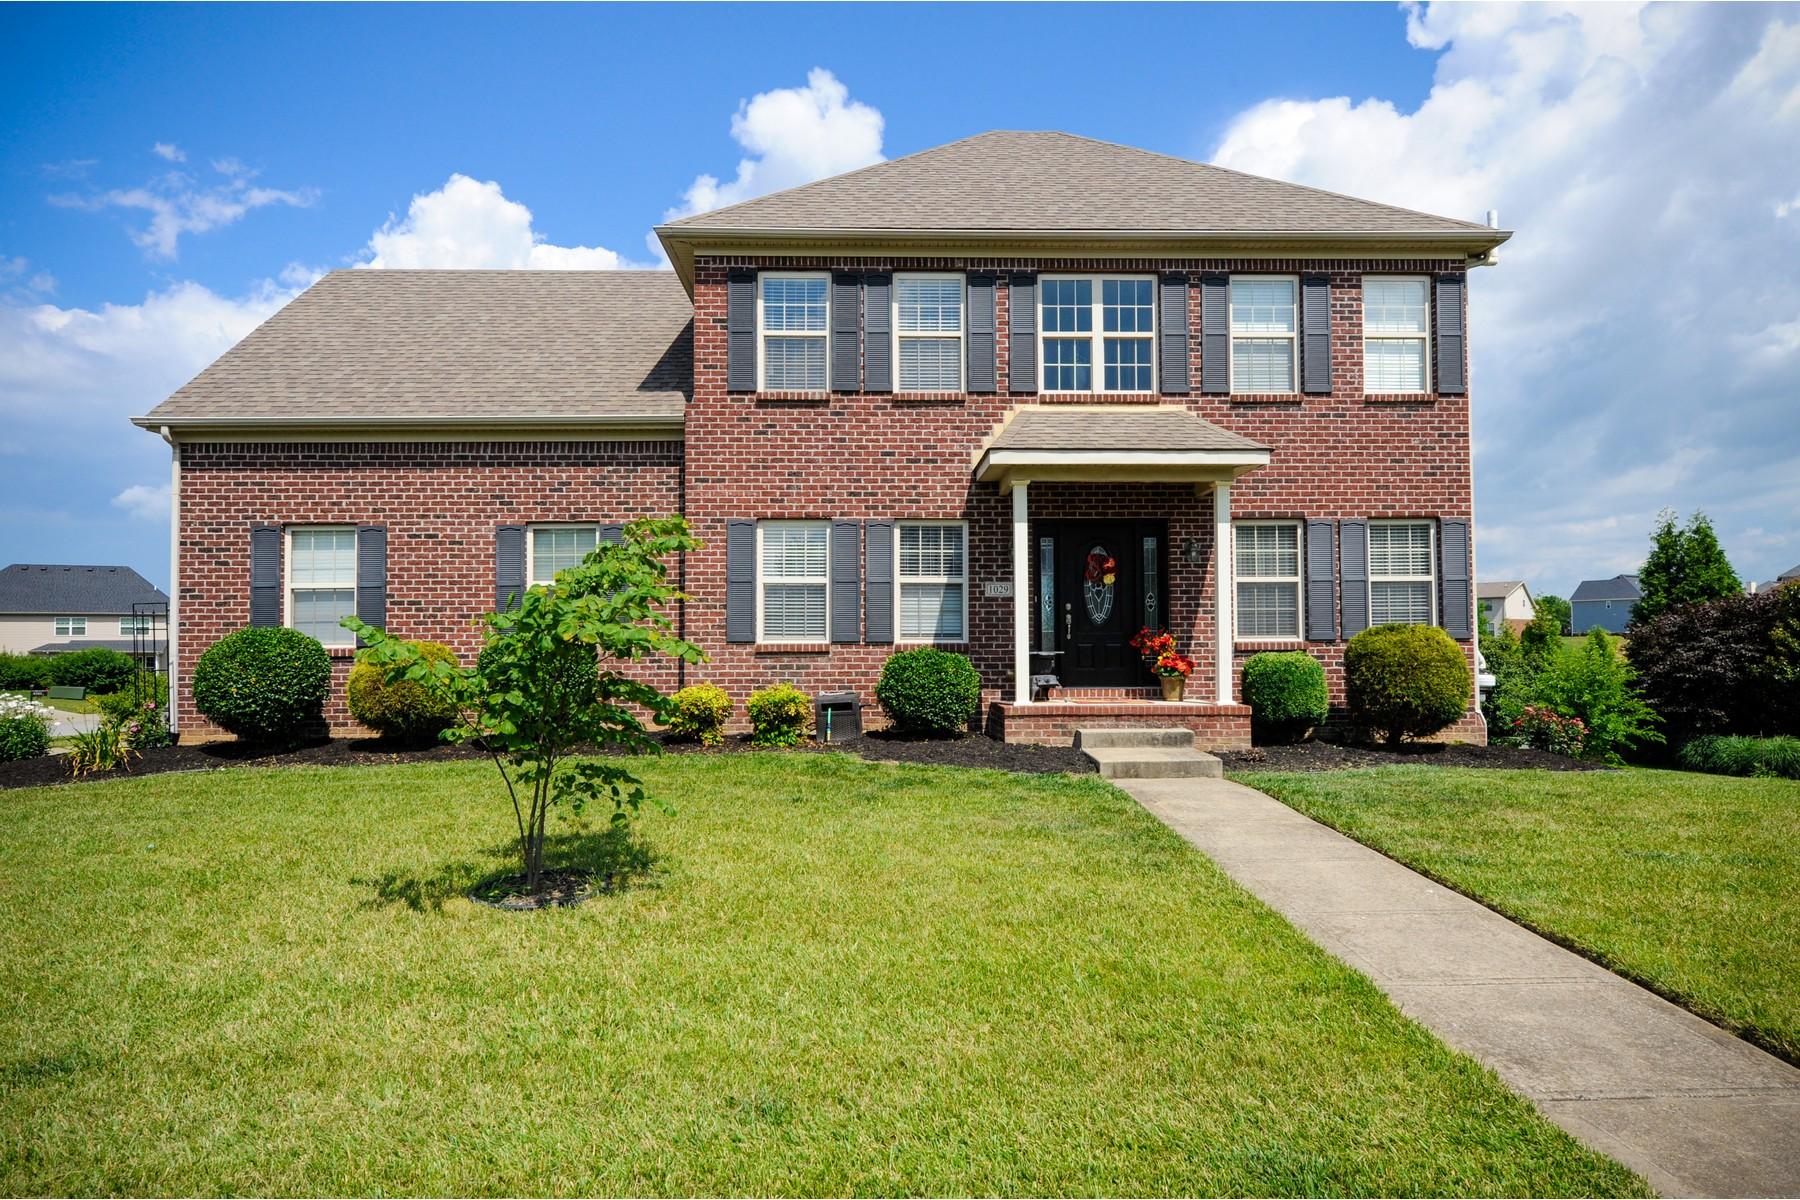 Single Family Home for Sale at 1029 Cedar Ridge 1029 Cedar Ridge Ln Versailles, Kentucky, 40383 United States